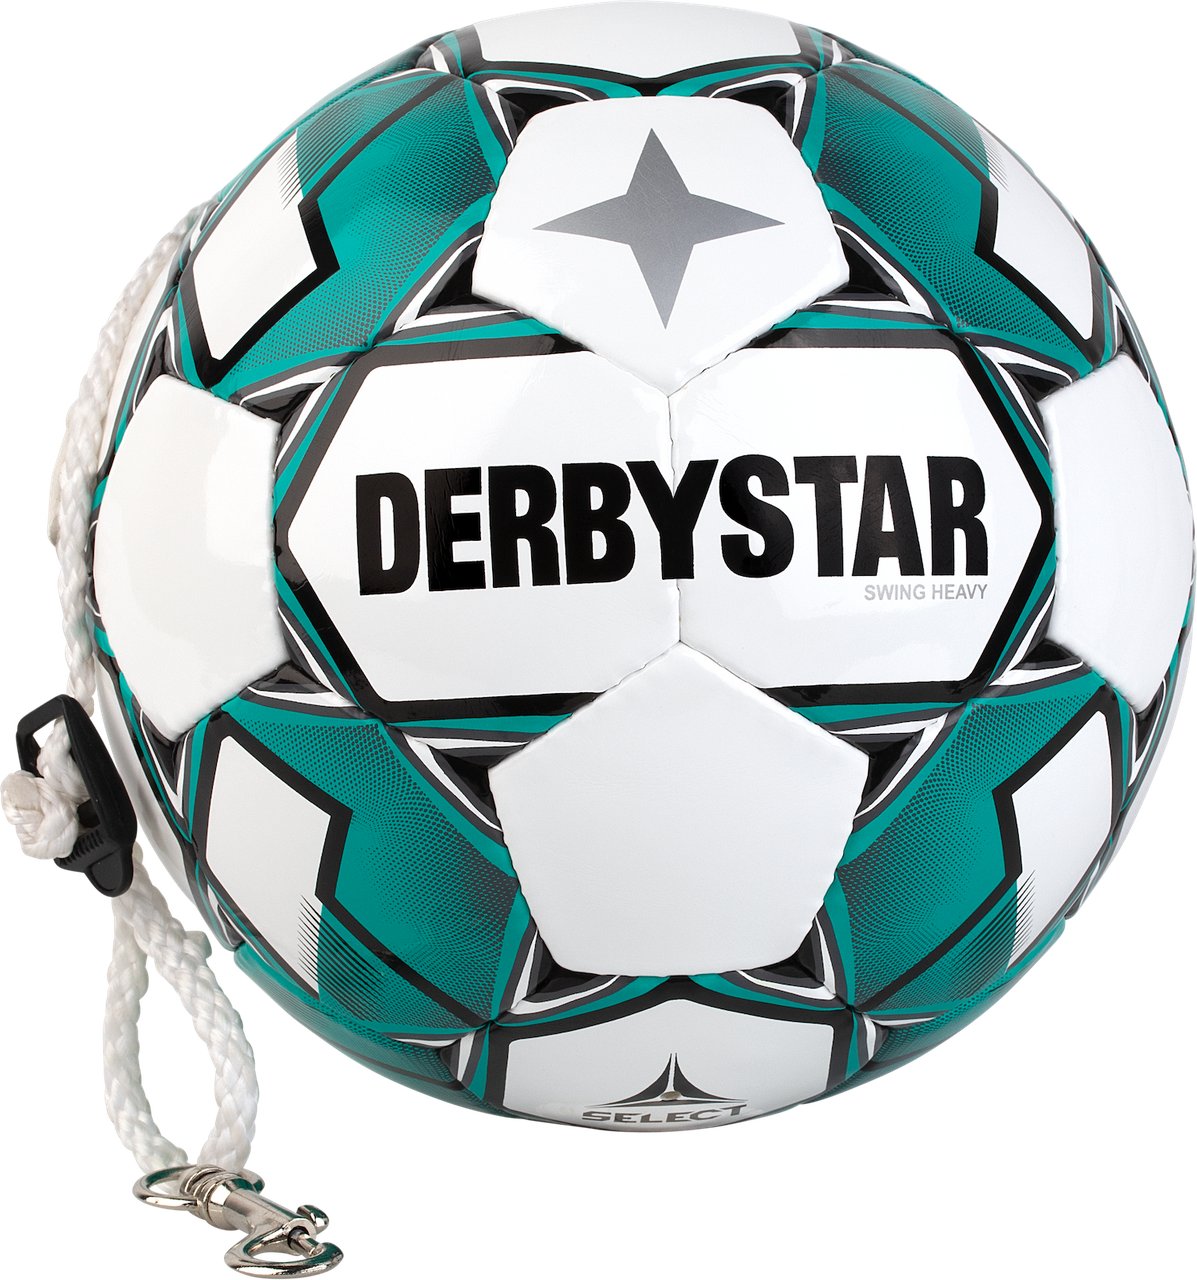 DERBYSTAR Pendulum Ball - SWING HEAVY